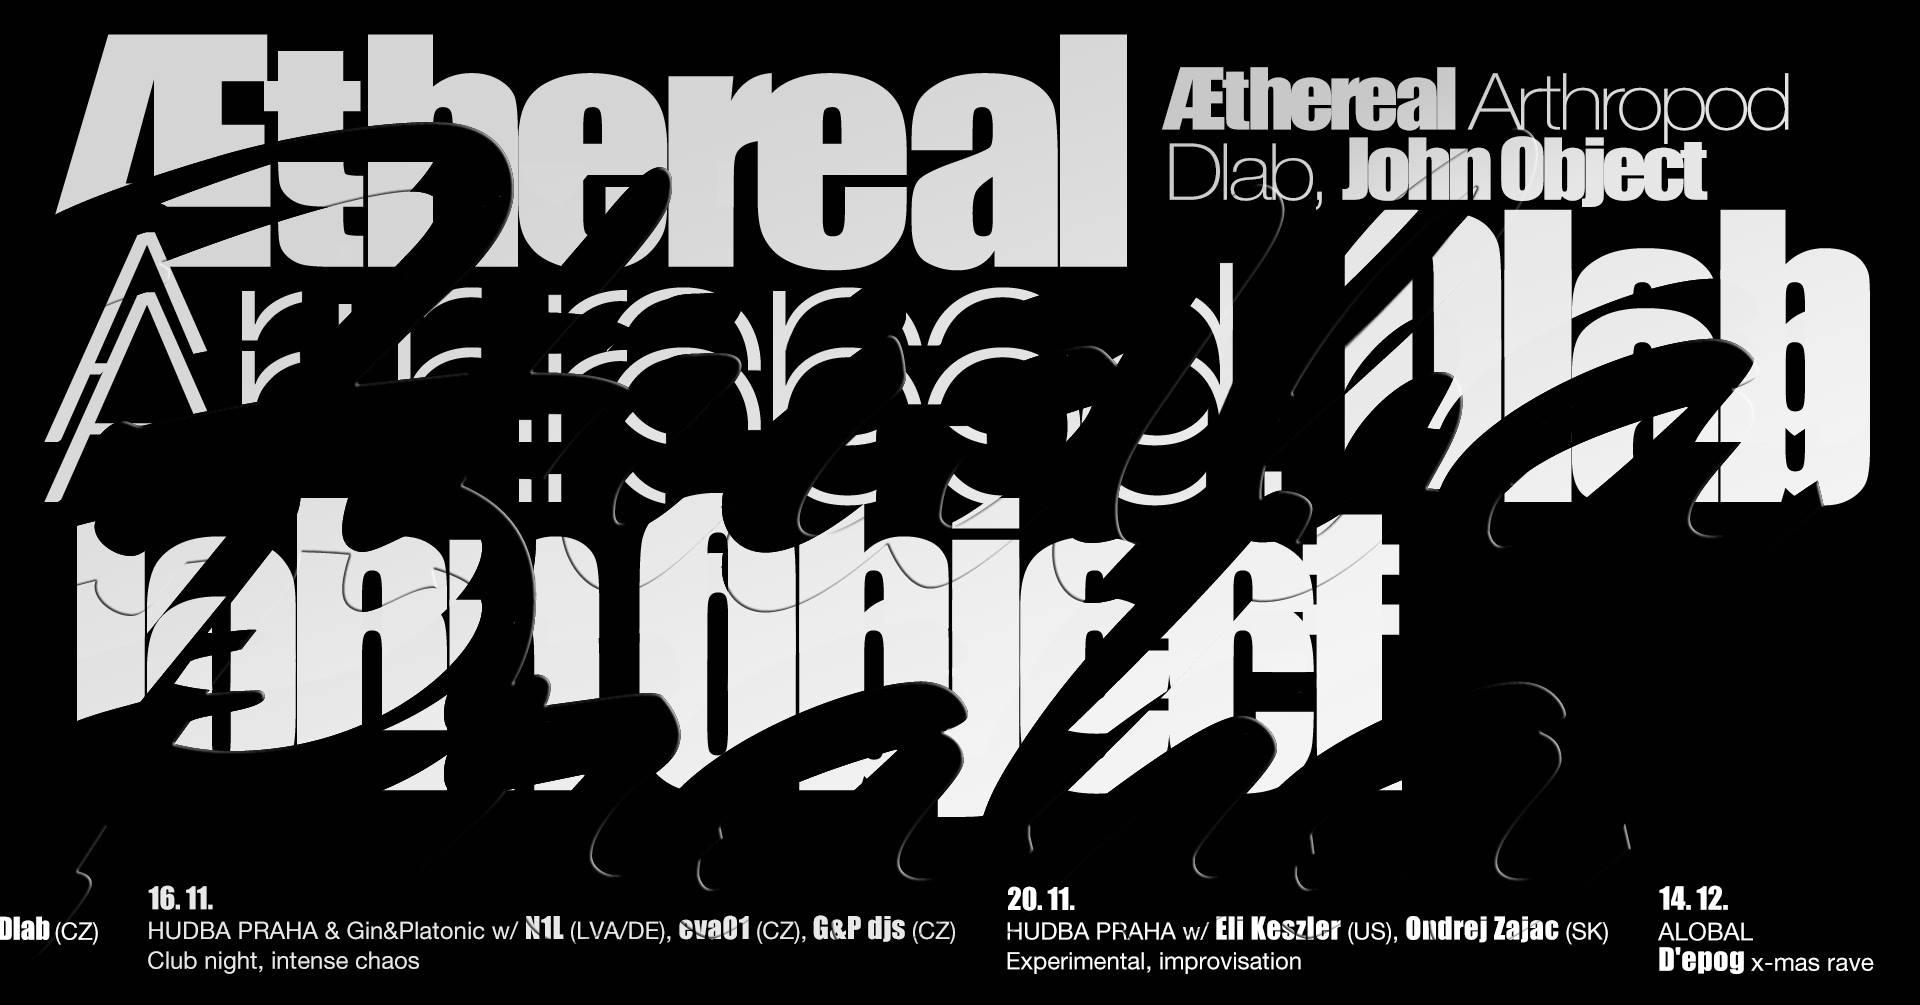 PÁ / 26.10. / 21.00 / HUDBA PRAHA w/ Æthereal Arthropod (ESP), John Object (UA), Dlab (CZ) / koncert, dj set